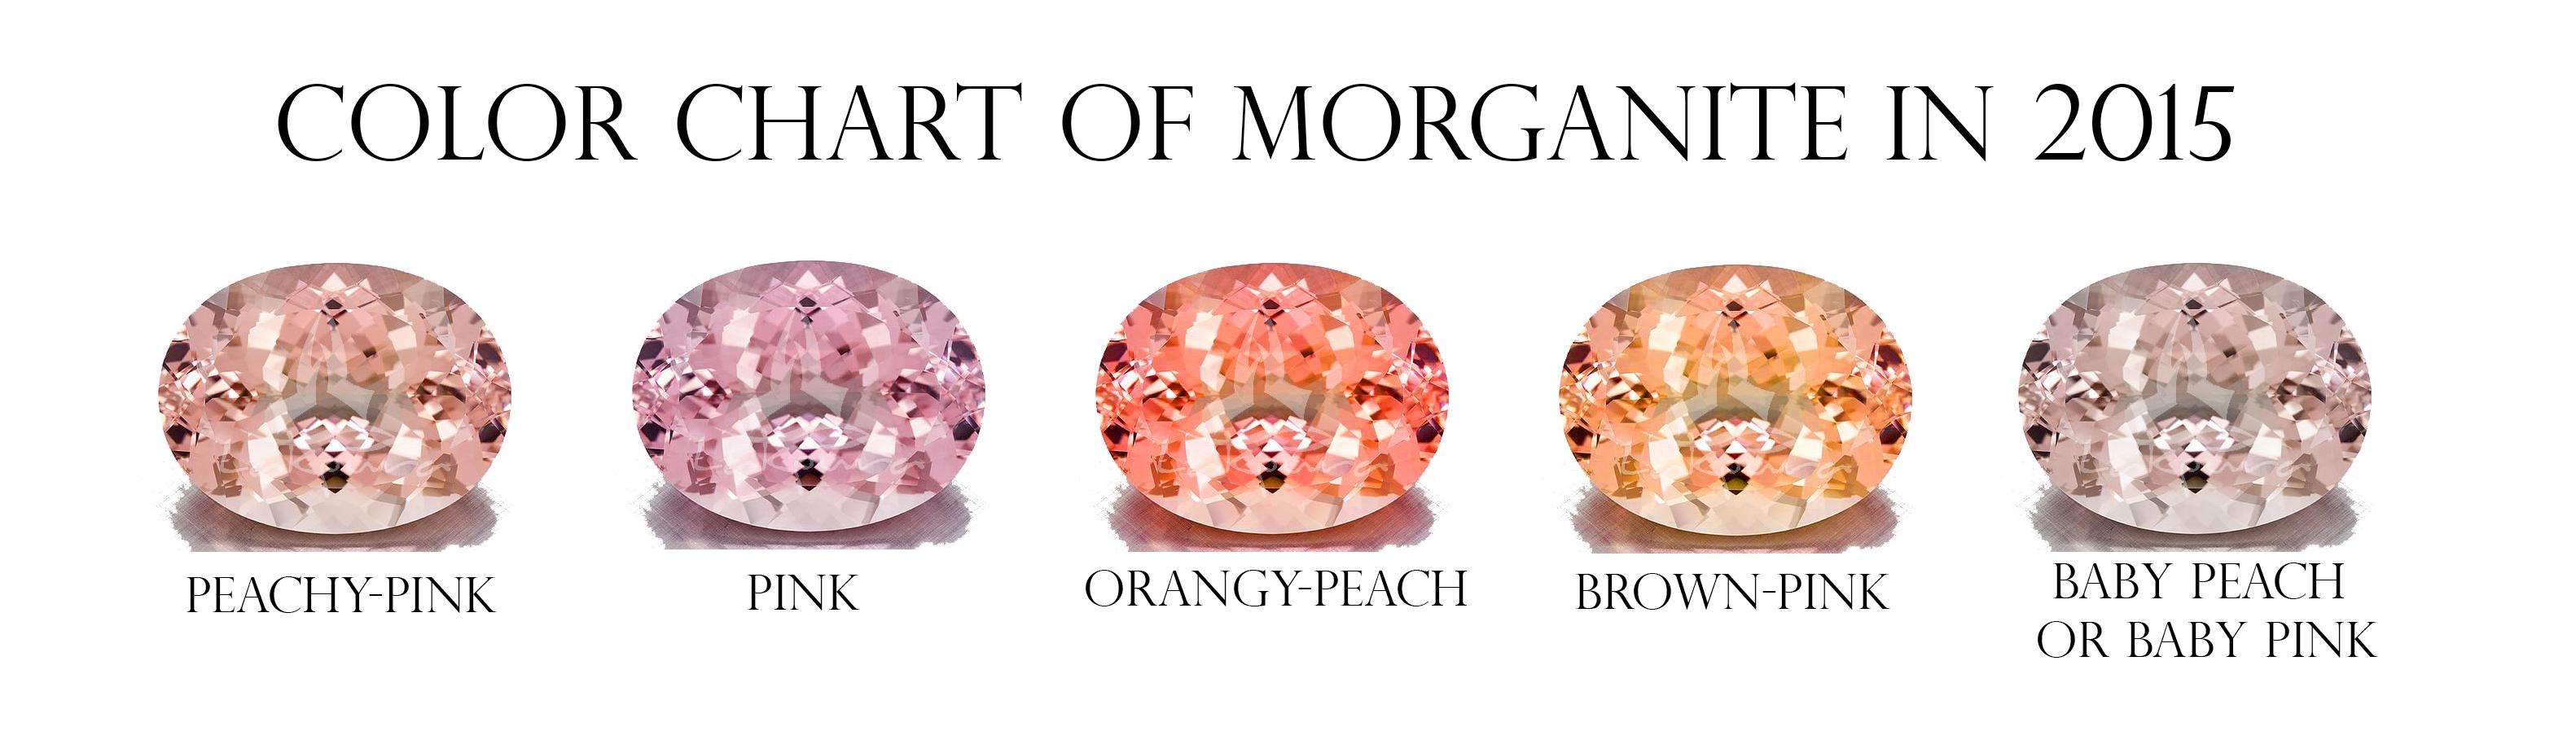 Morganite Color Chart